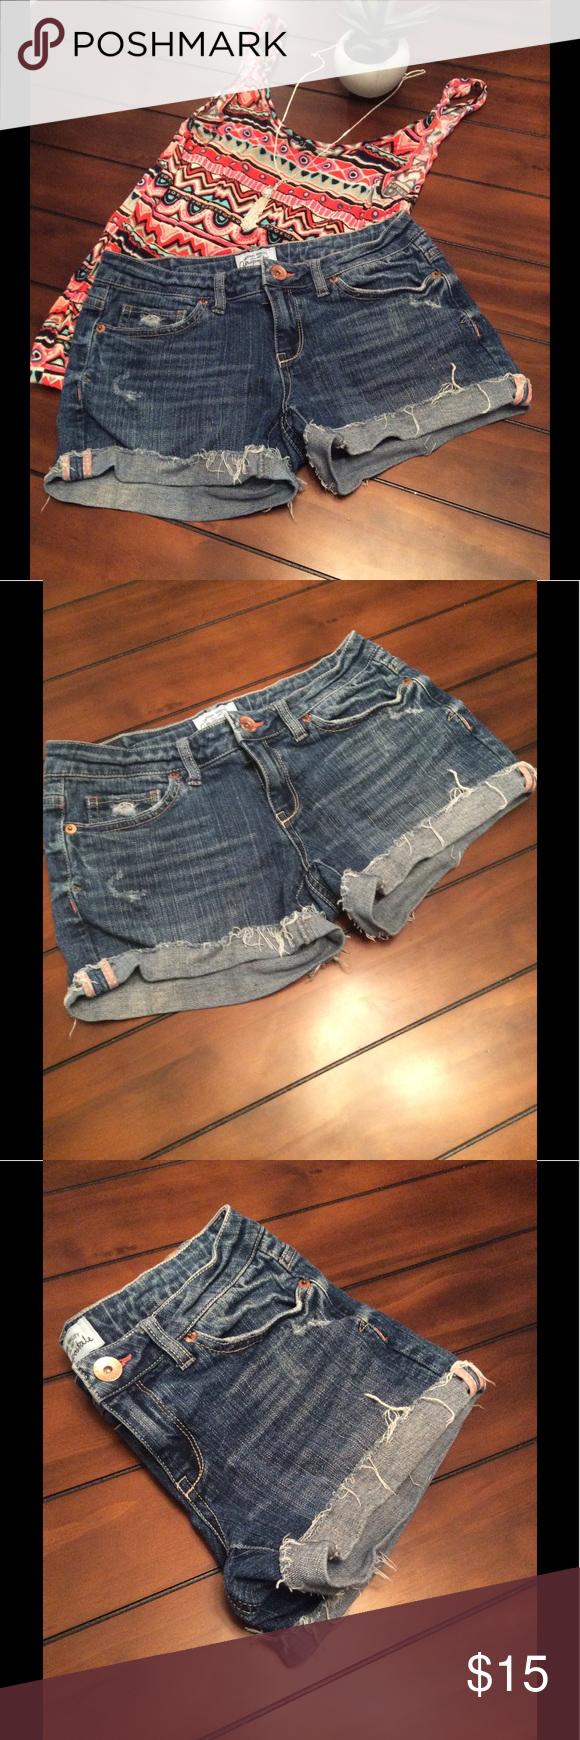 Aeropostale Denim Shorts Distressed Aeropostale Denim Shorts with fringes on the rolled leg. Medium Wash. JB Aeropostale Shorts Jean Shorts